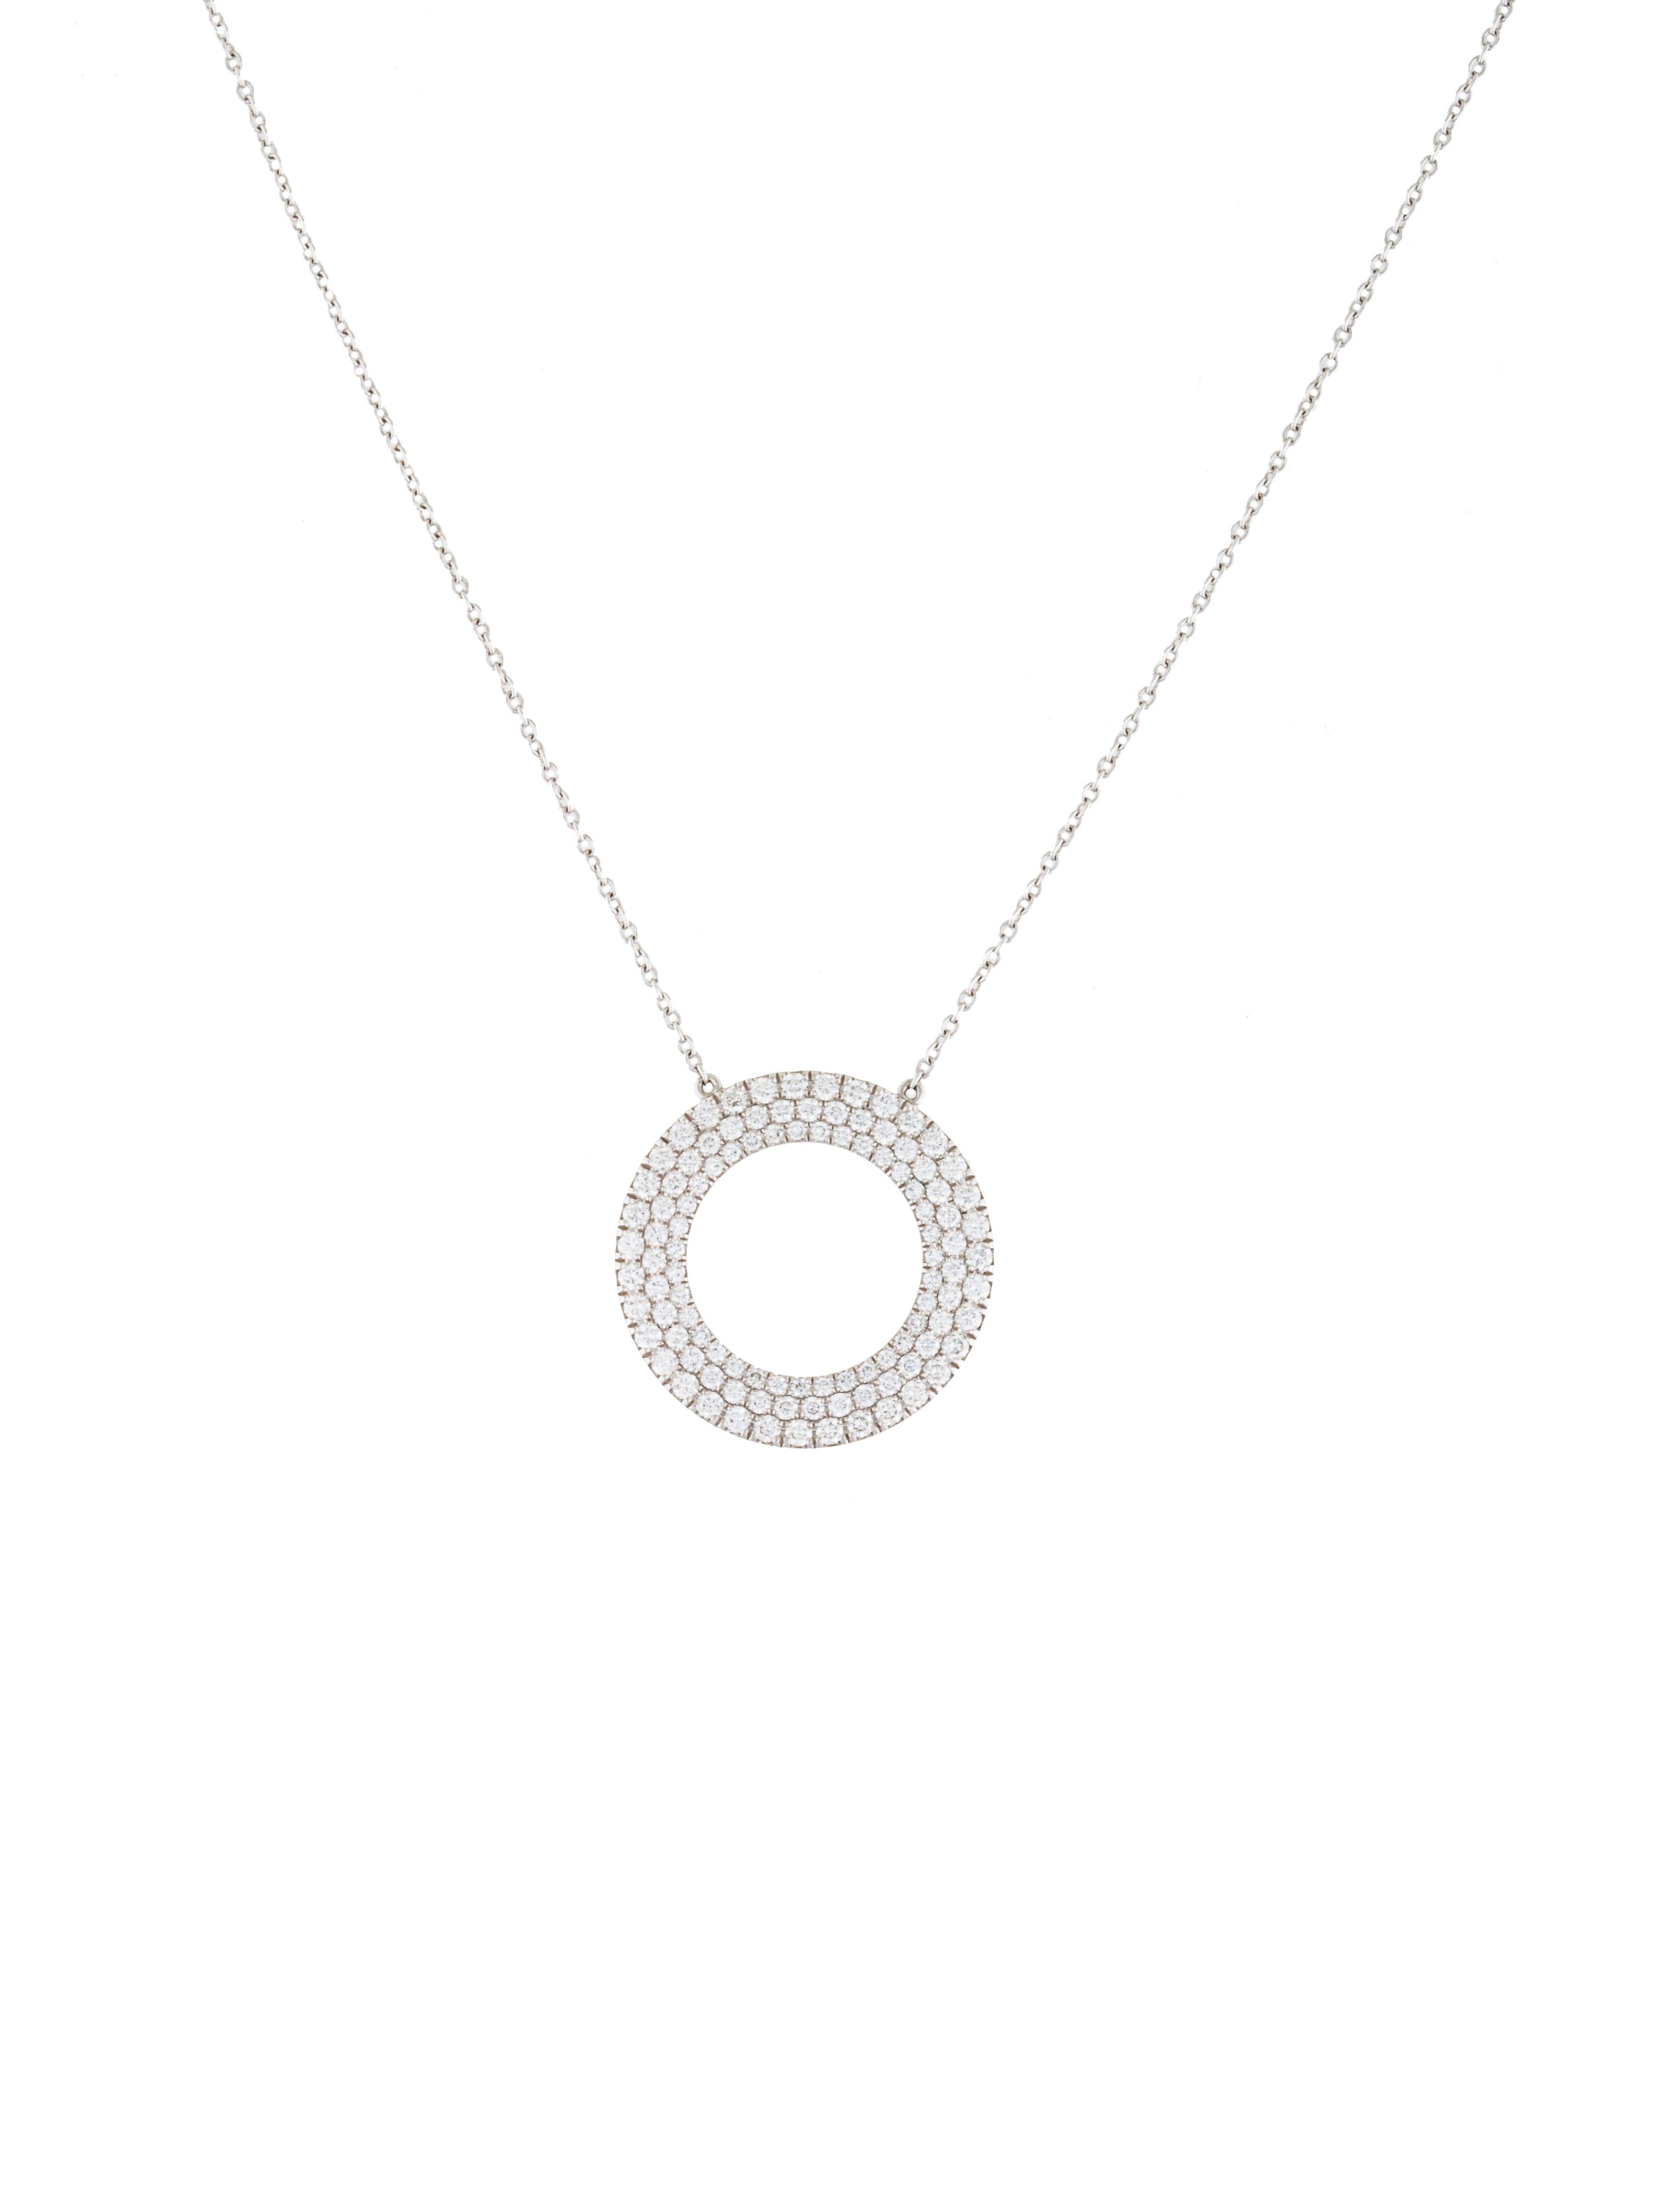 c25ec79f2 Tiffany & Co. 18K Diamond Metro Three-Row Circle Pendant Necklace -  Necklaces - TIF52328 | The RealReal